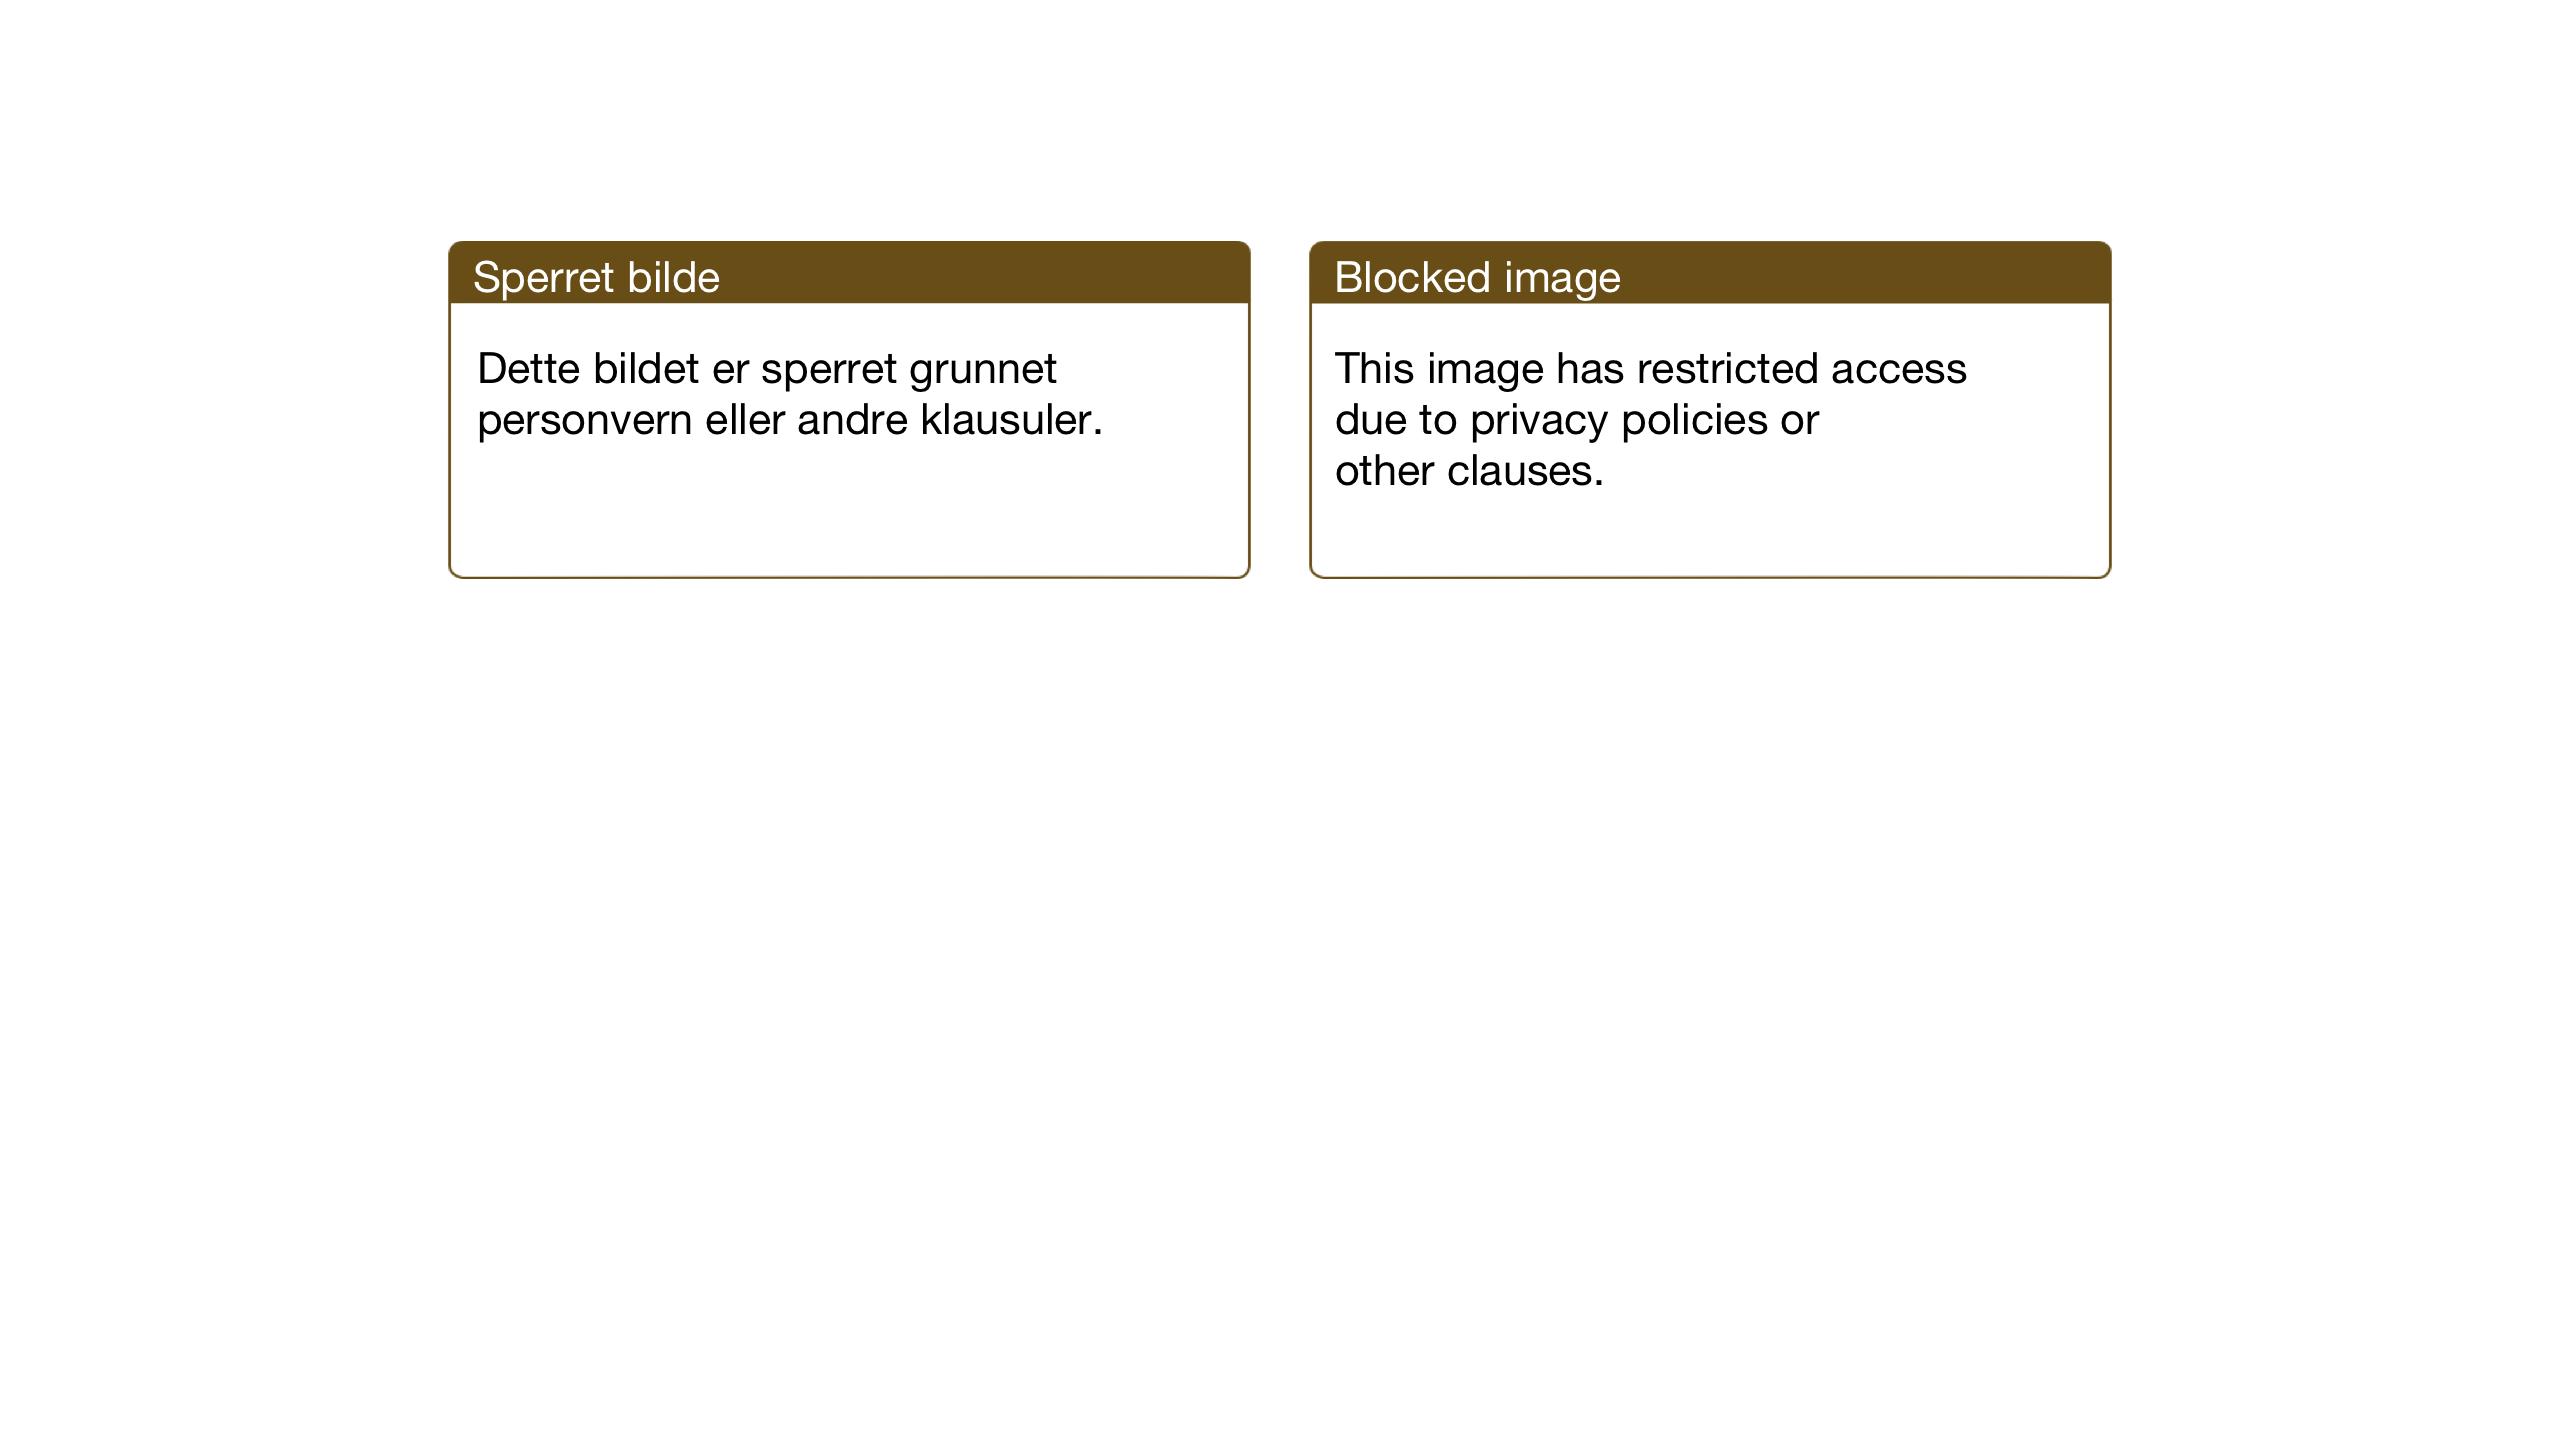 SAT, Ministerialprotokoller, klokkerbøker og fødselsregistre - Nordland, 803/L0077: Klokkerbok nr. 803C04, 1897-1930, s. 75